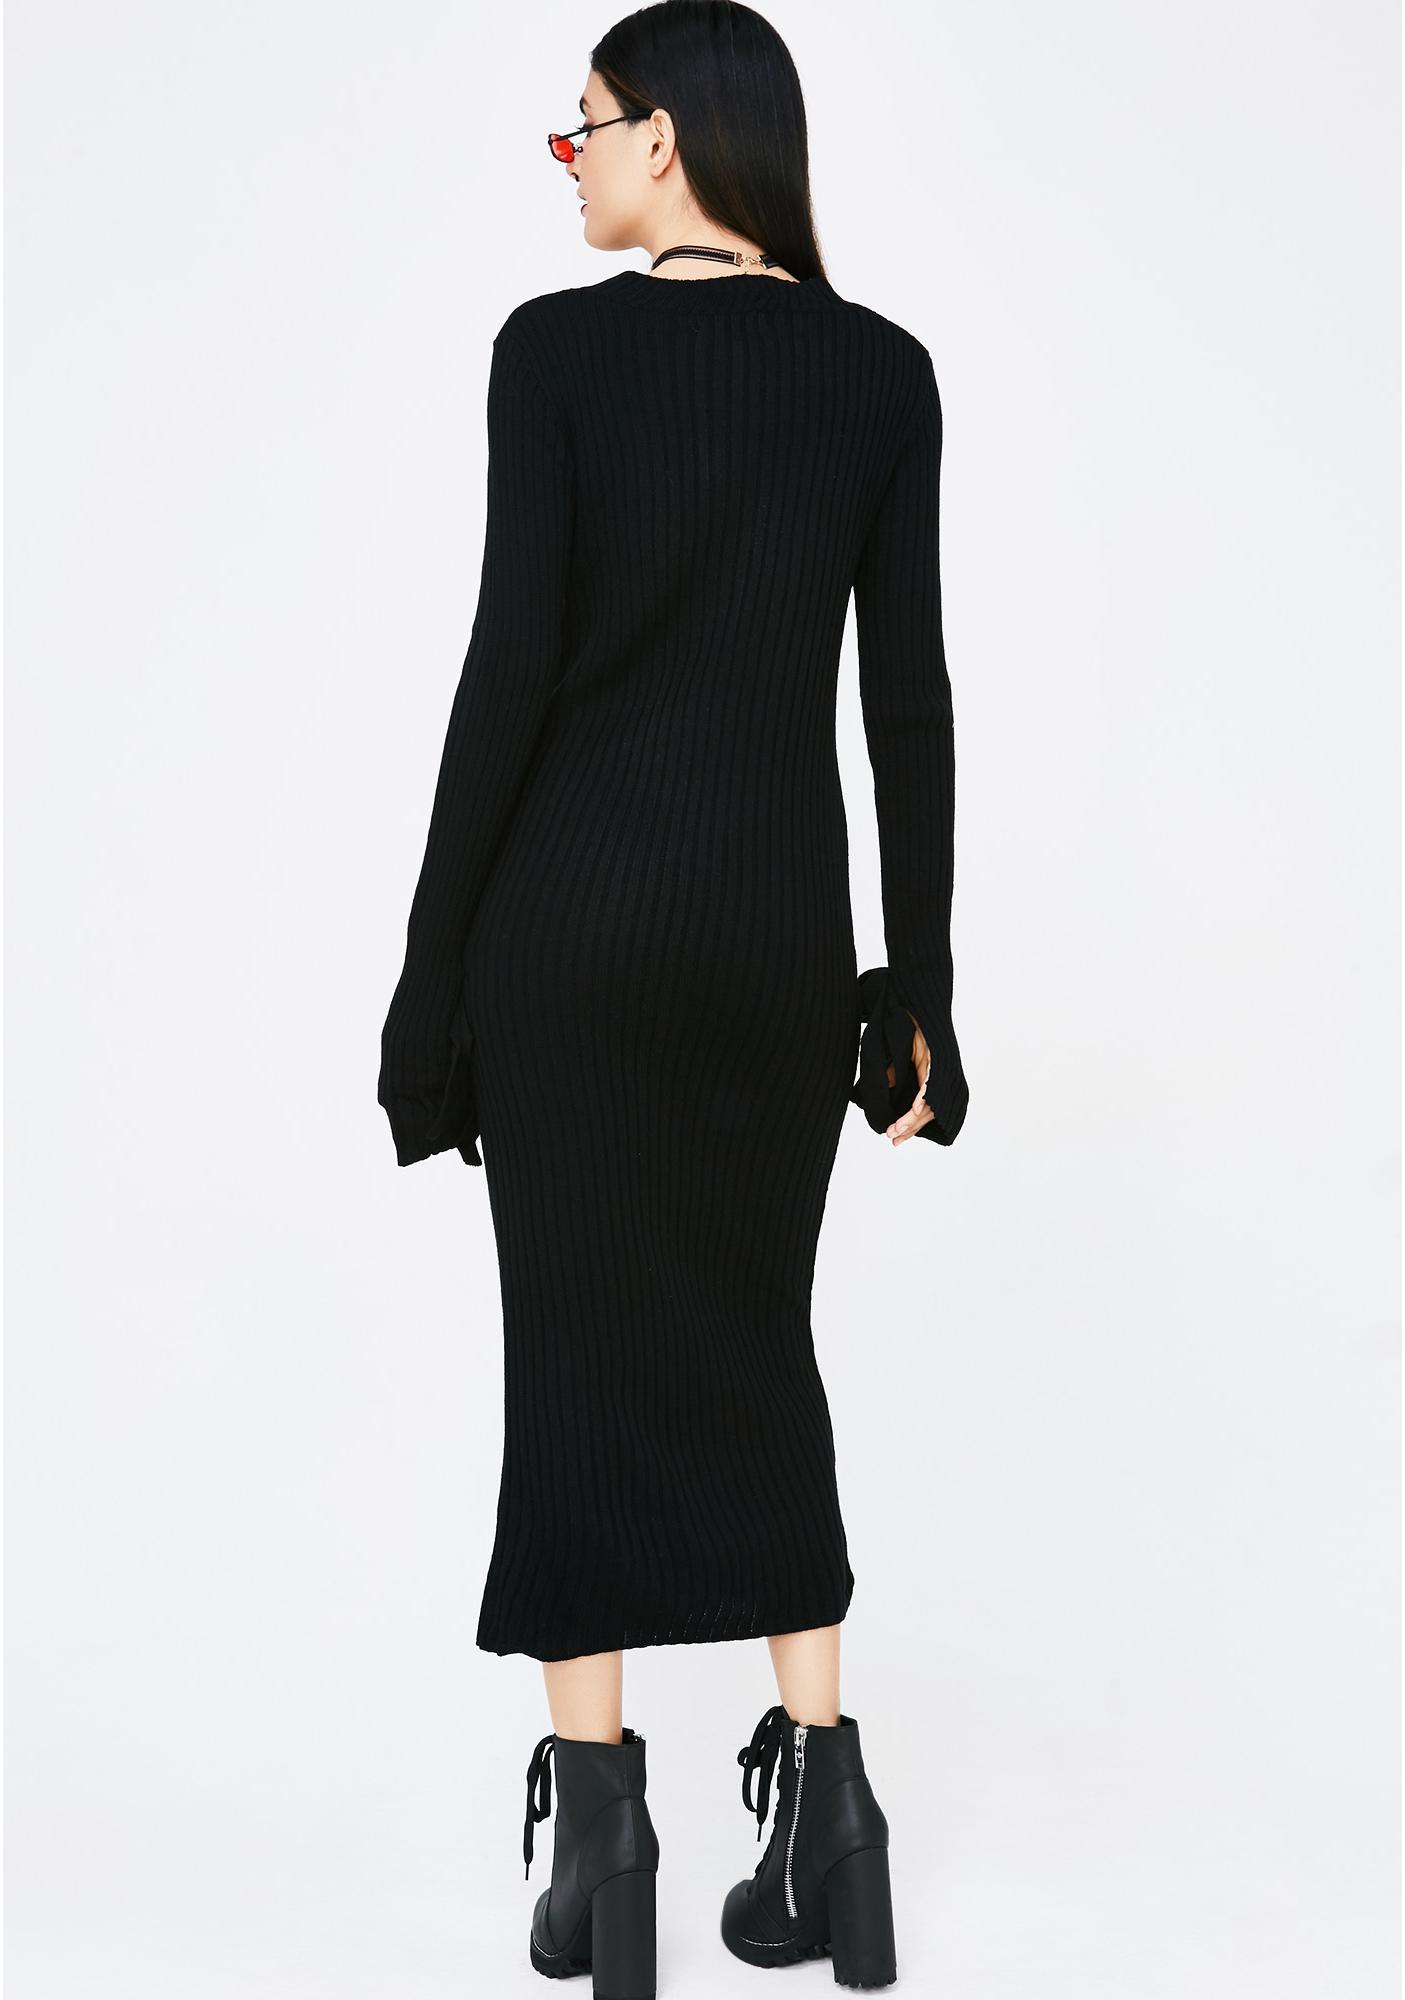 Bitch Craft Sweater Dress